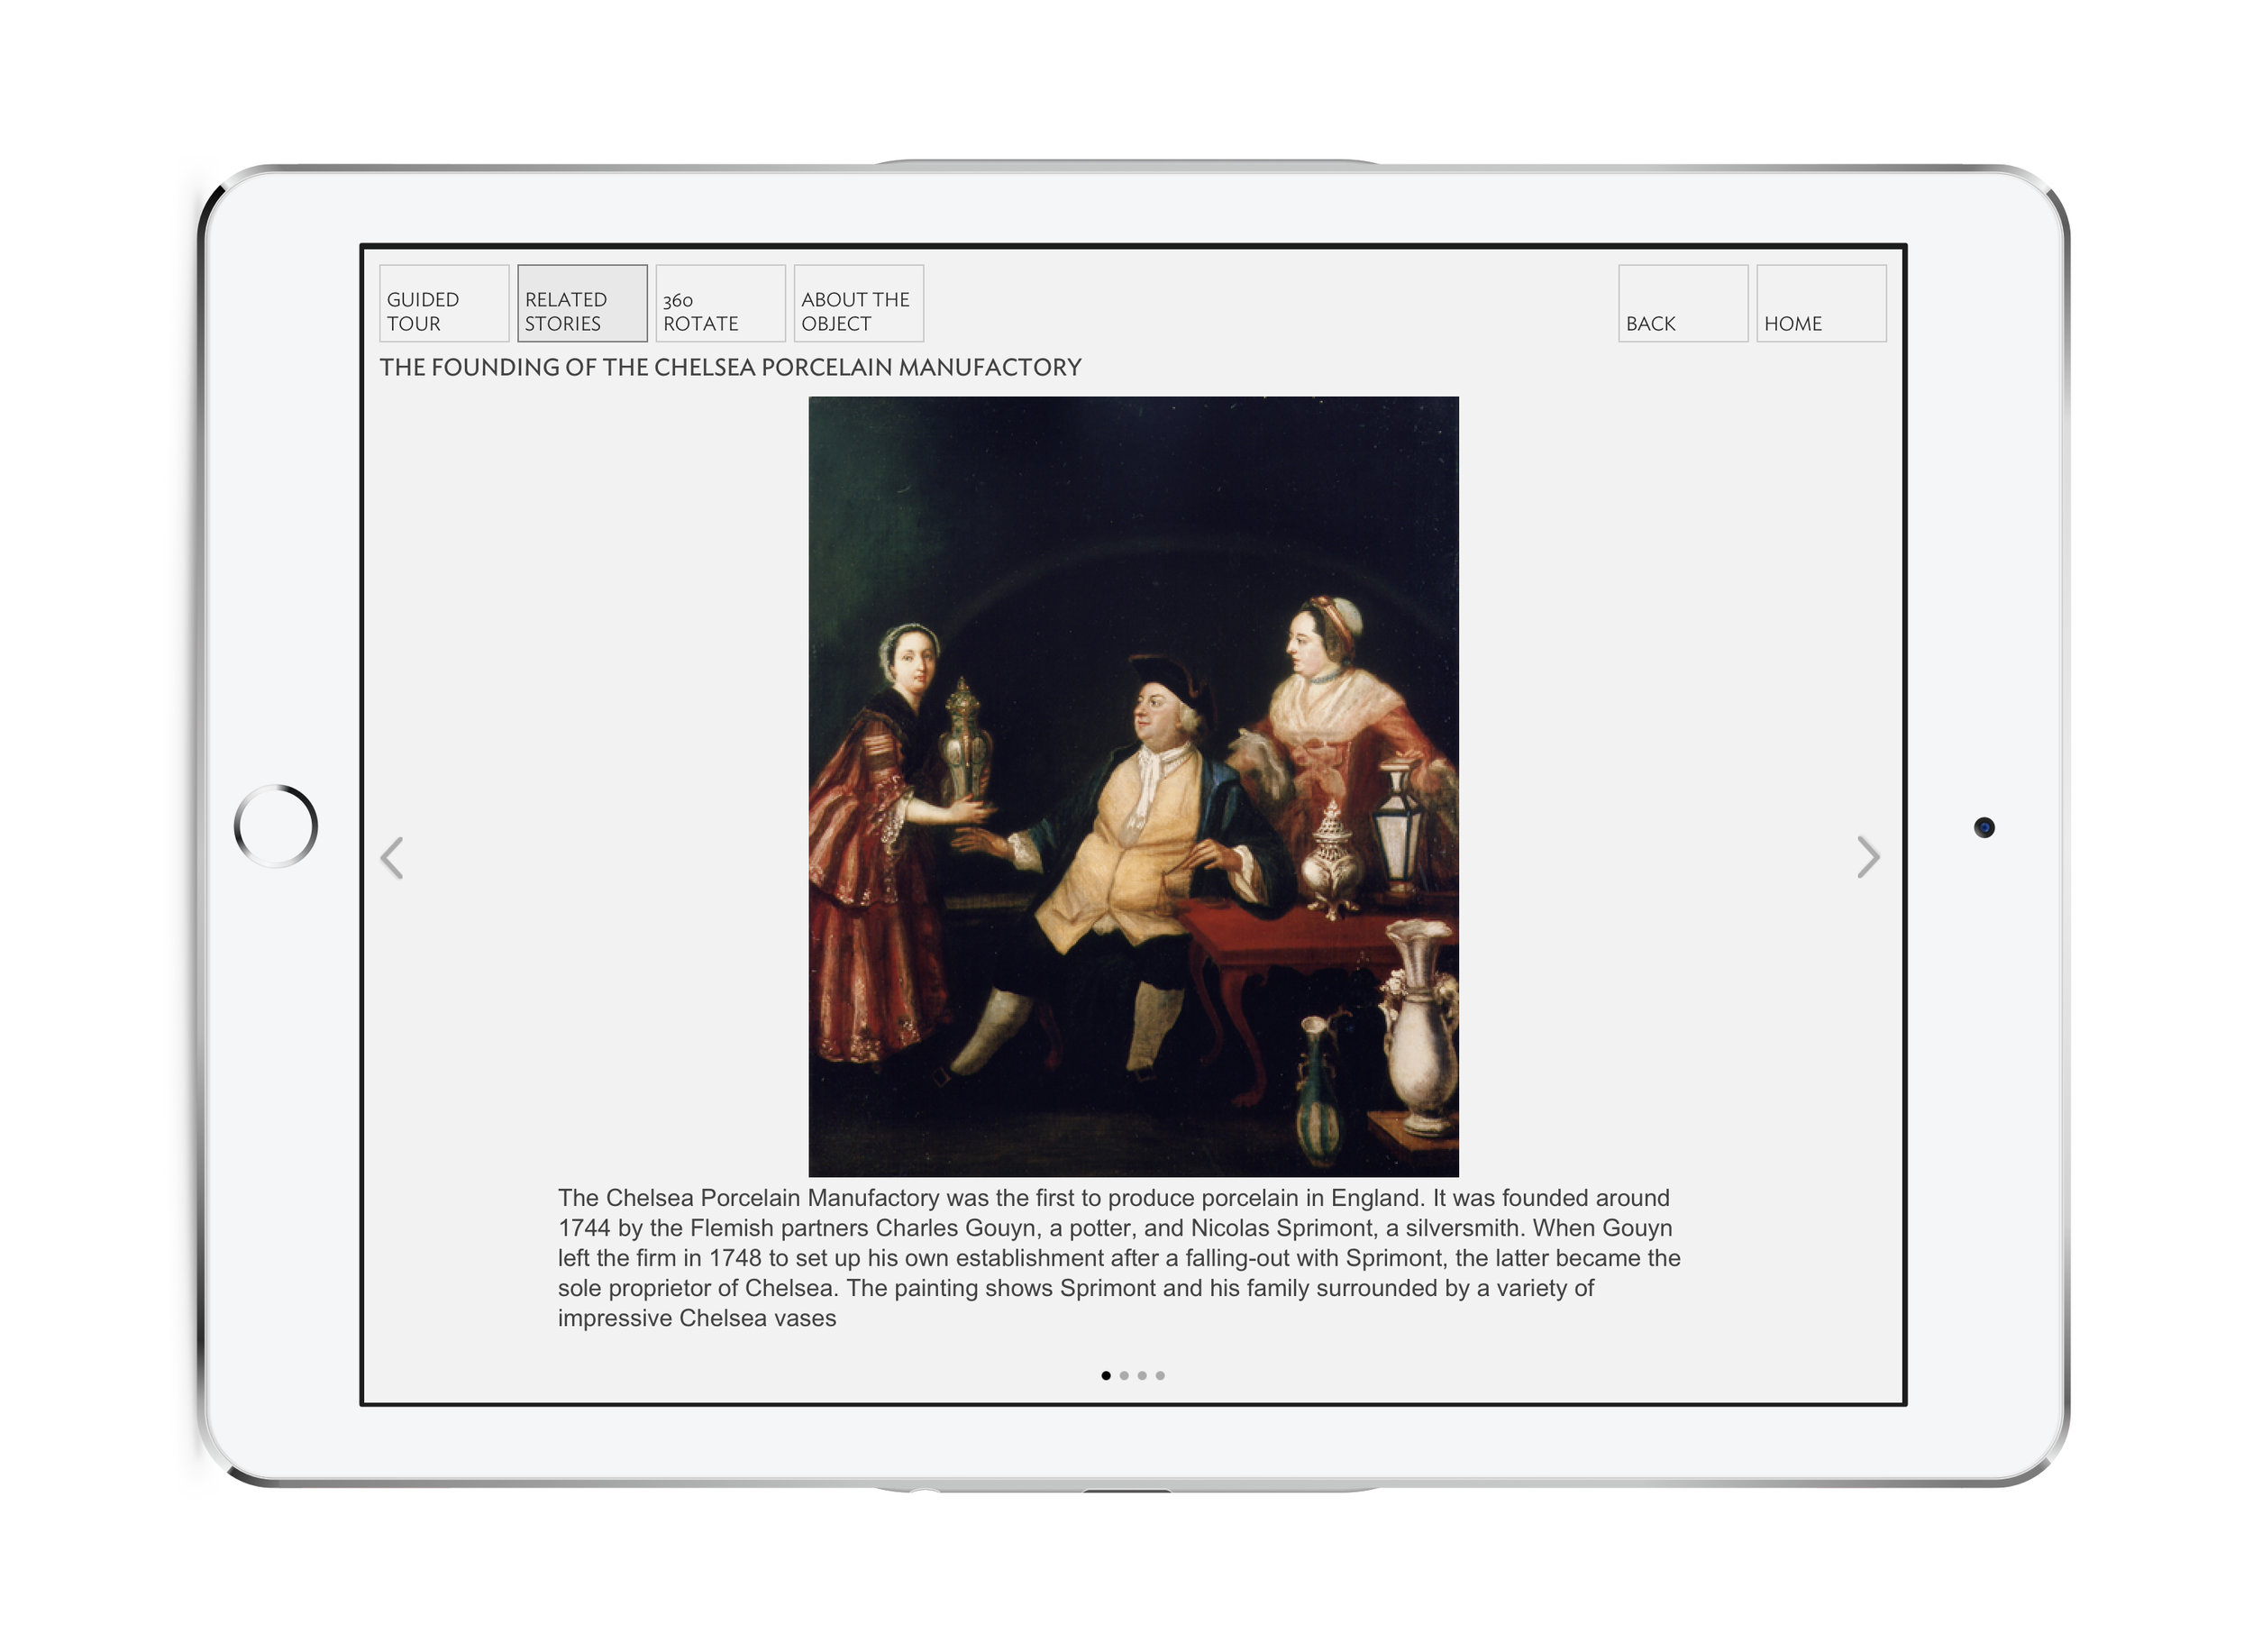 6aic-iPad-relatedstories.jpg